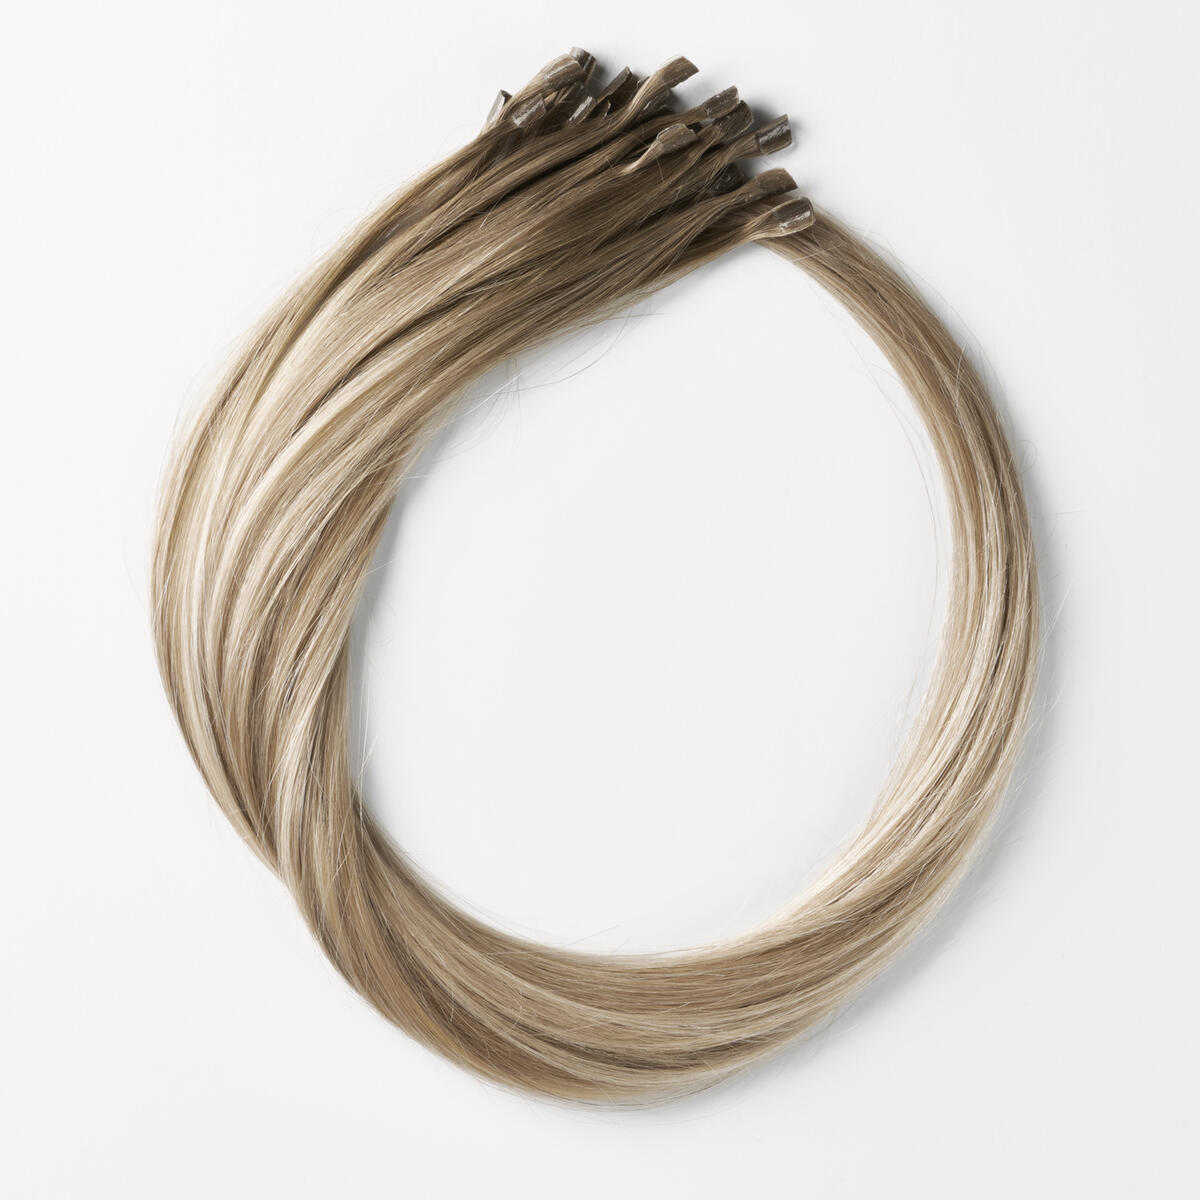 Nail Hair B2.6/10.7 Dark Ashy Blonde Balayage 40 cm